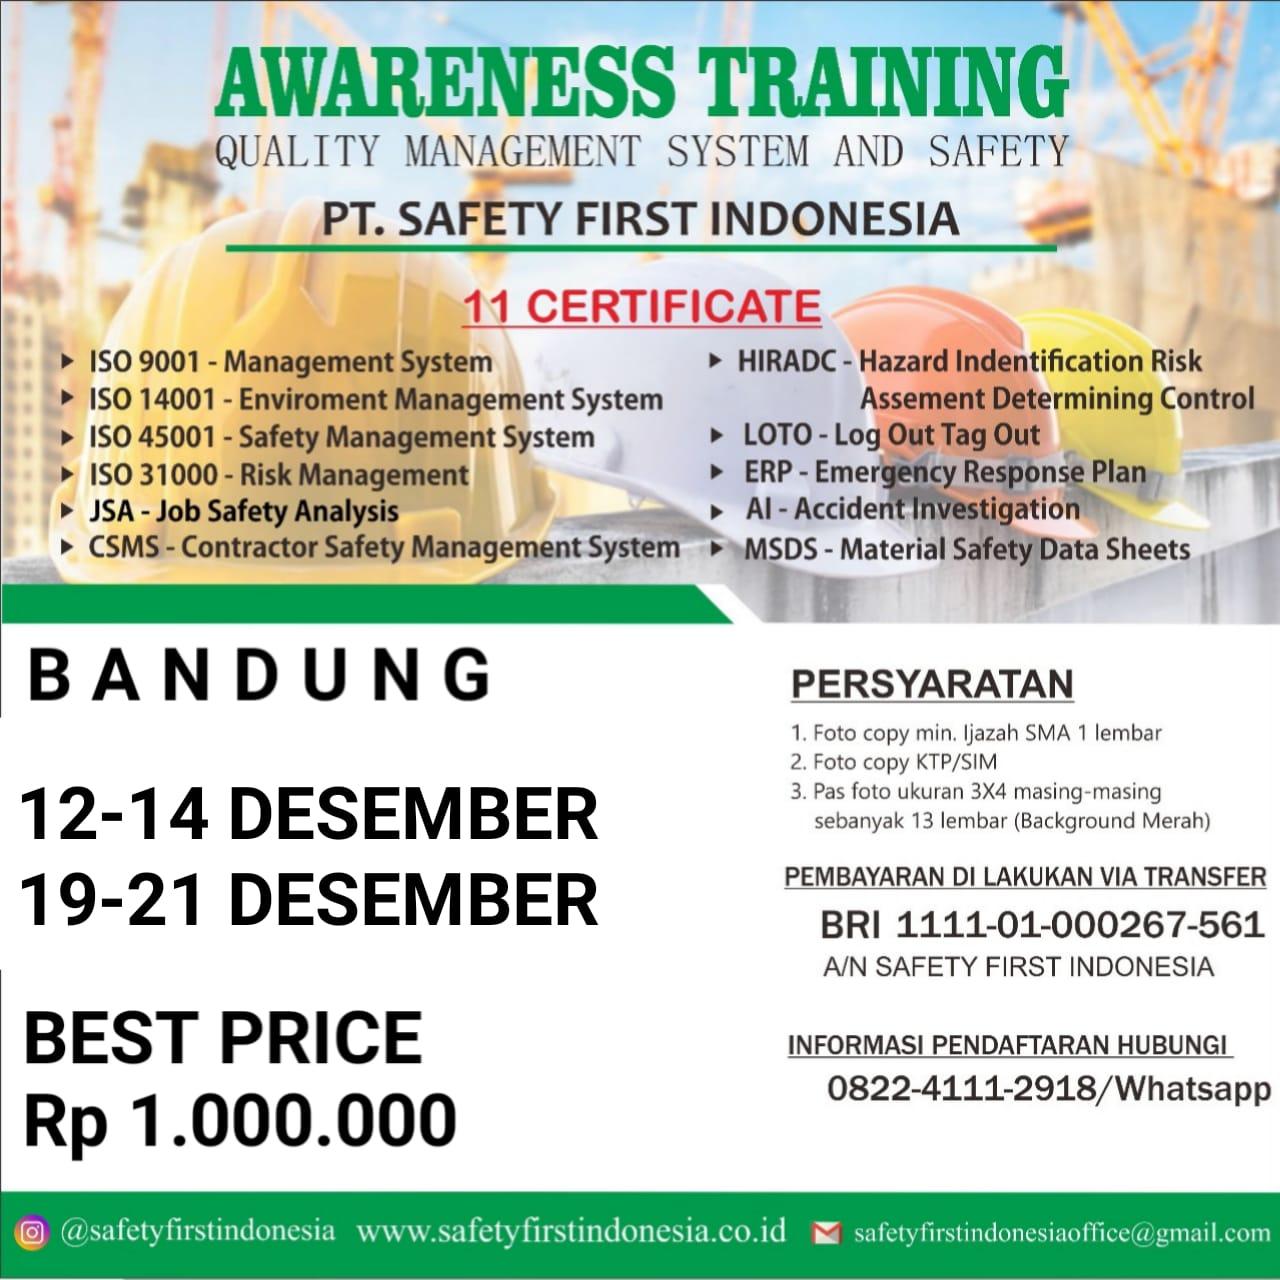 QMS Bandung Bulang Desember 2019